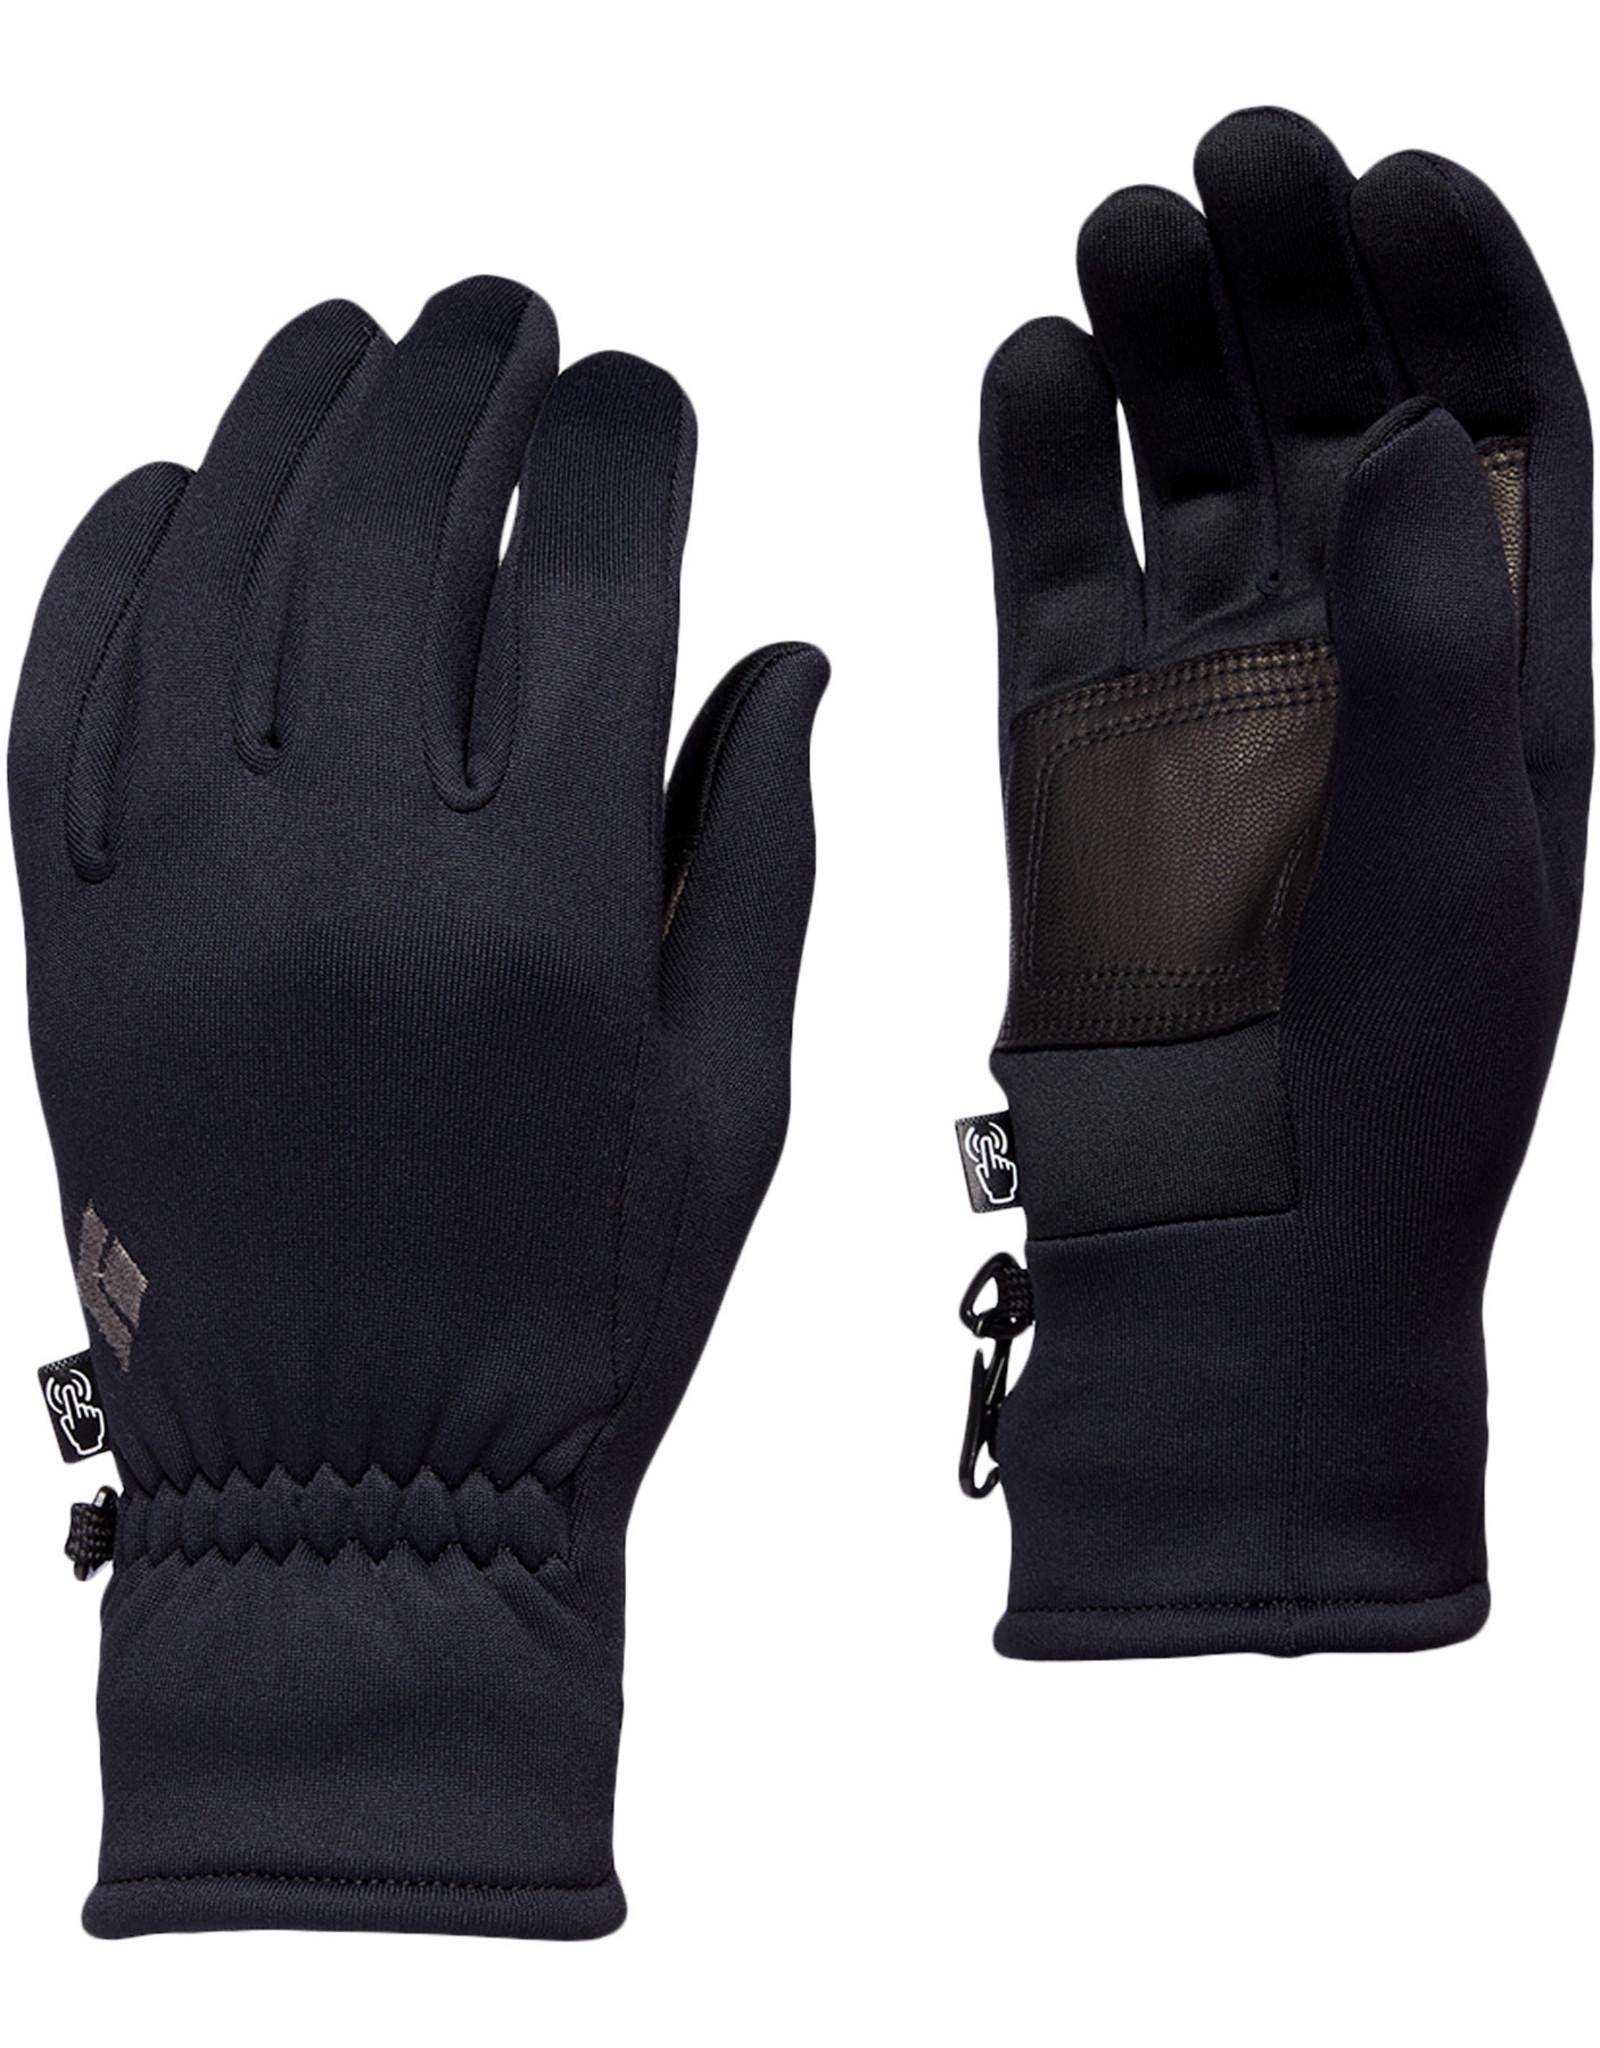 Black Diamond Heavyweight  Screentap Liner Glove